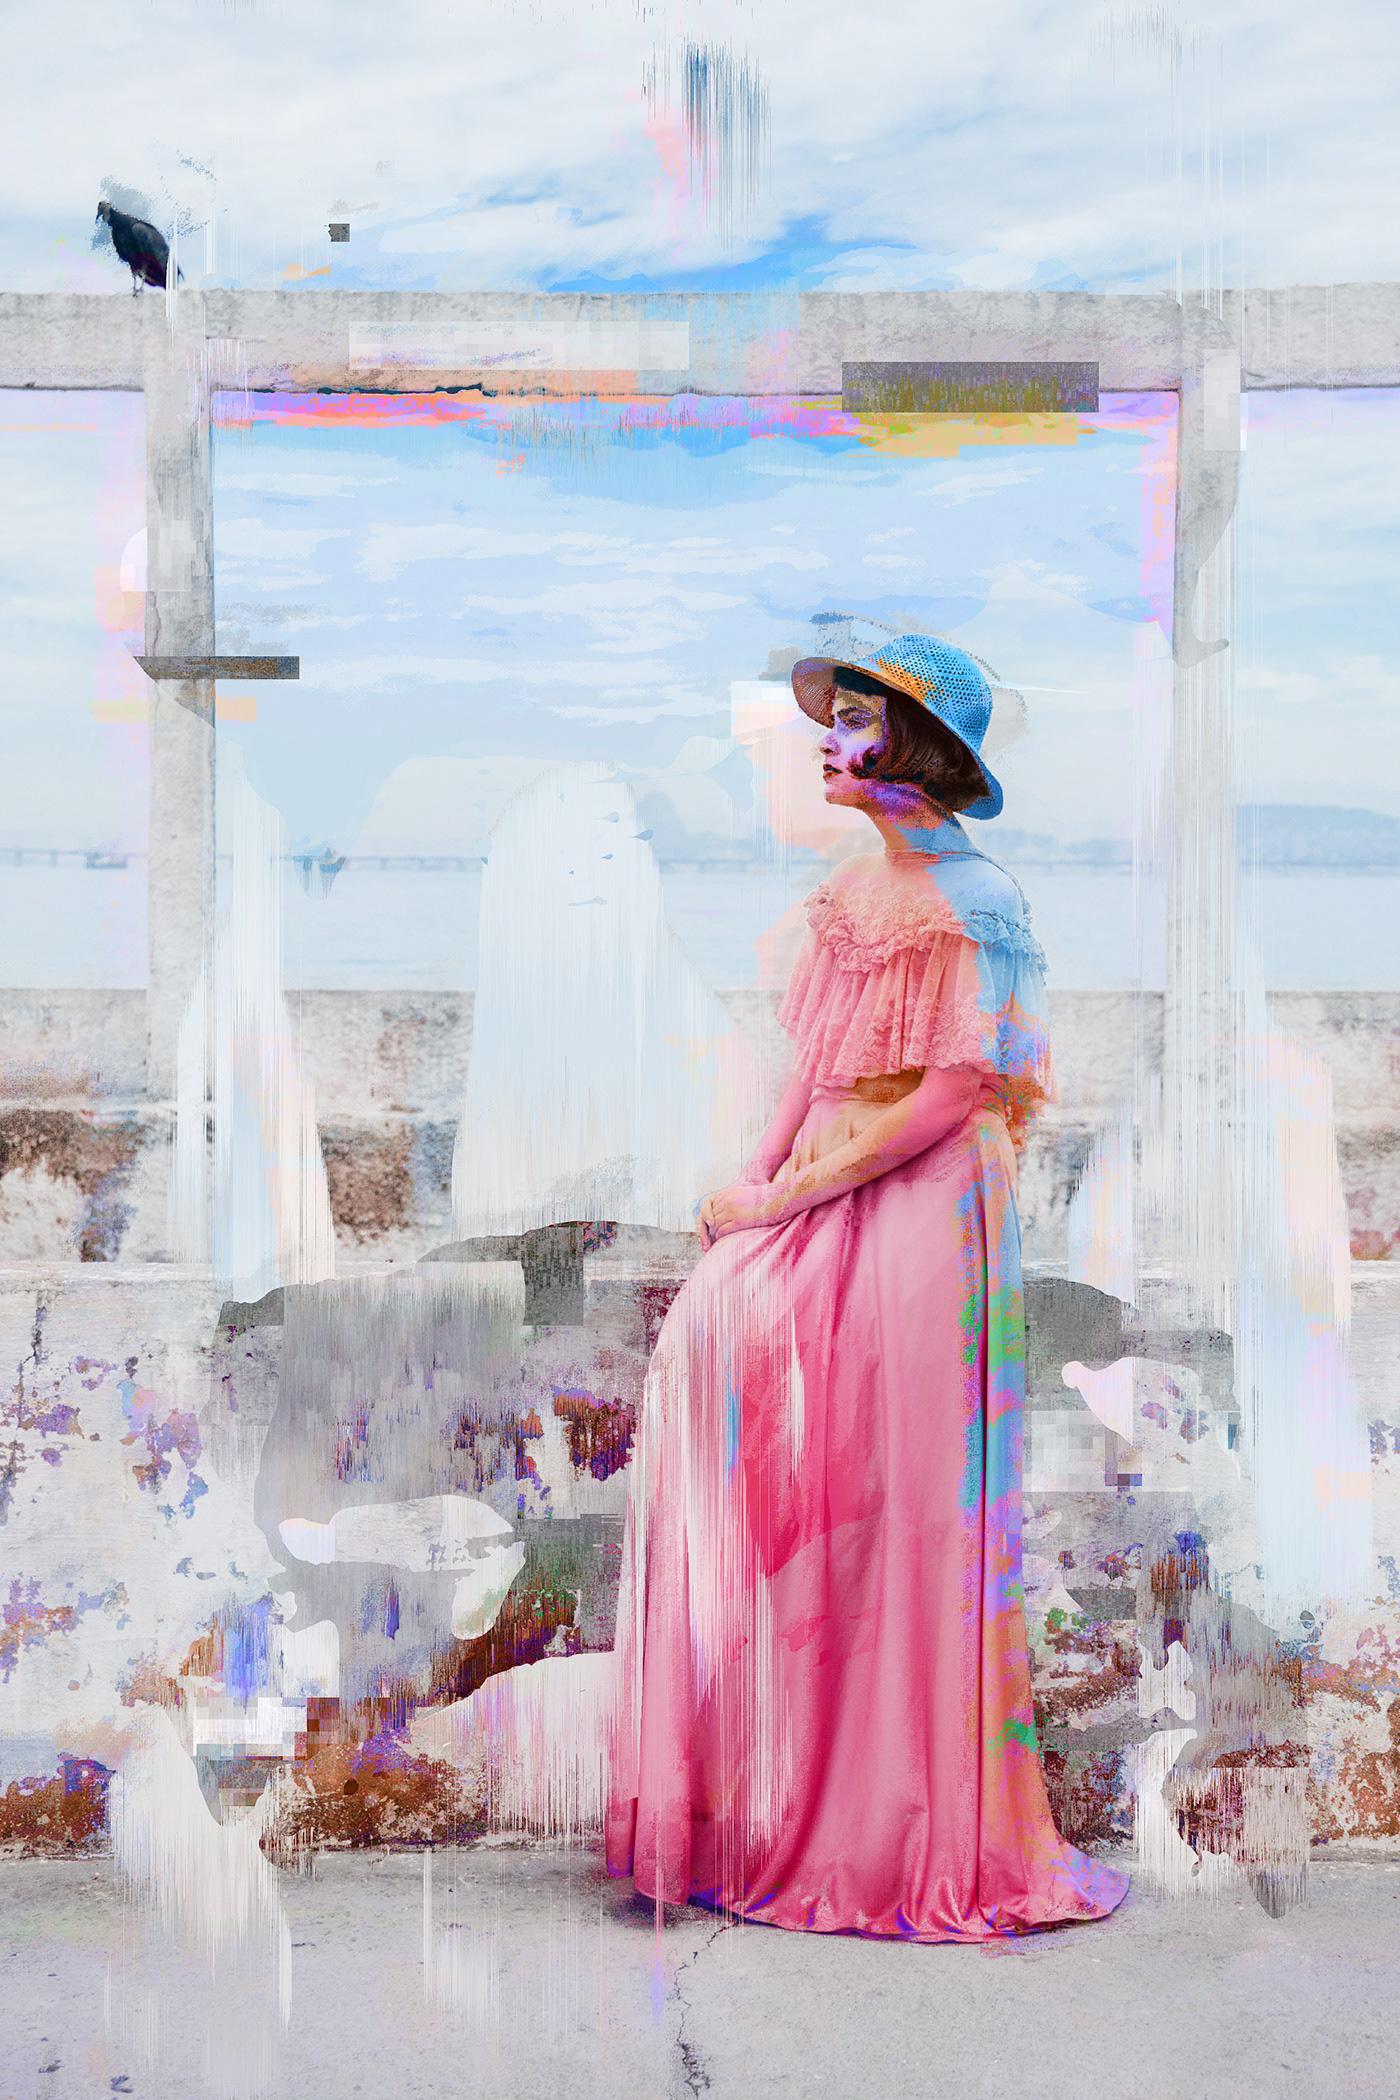 Glitch pixel sort unsplash abstract conceptual